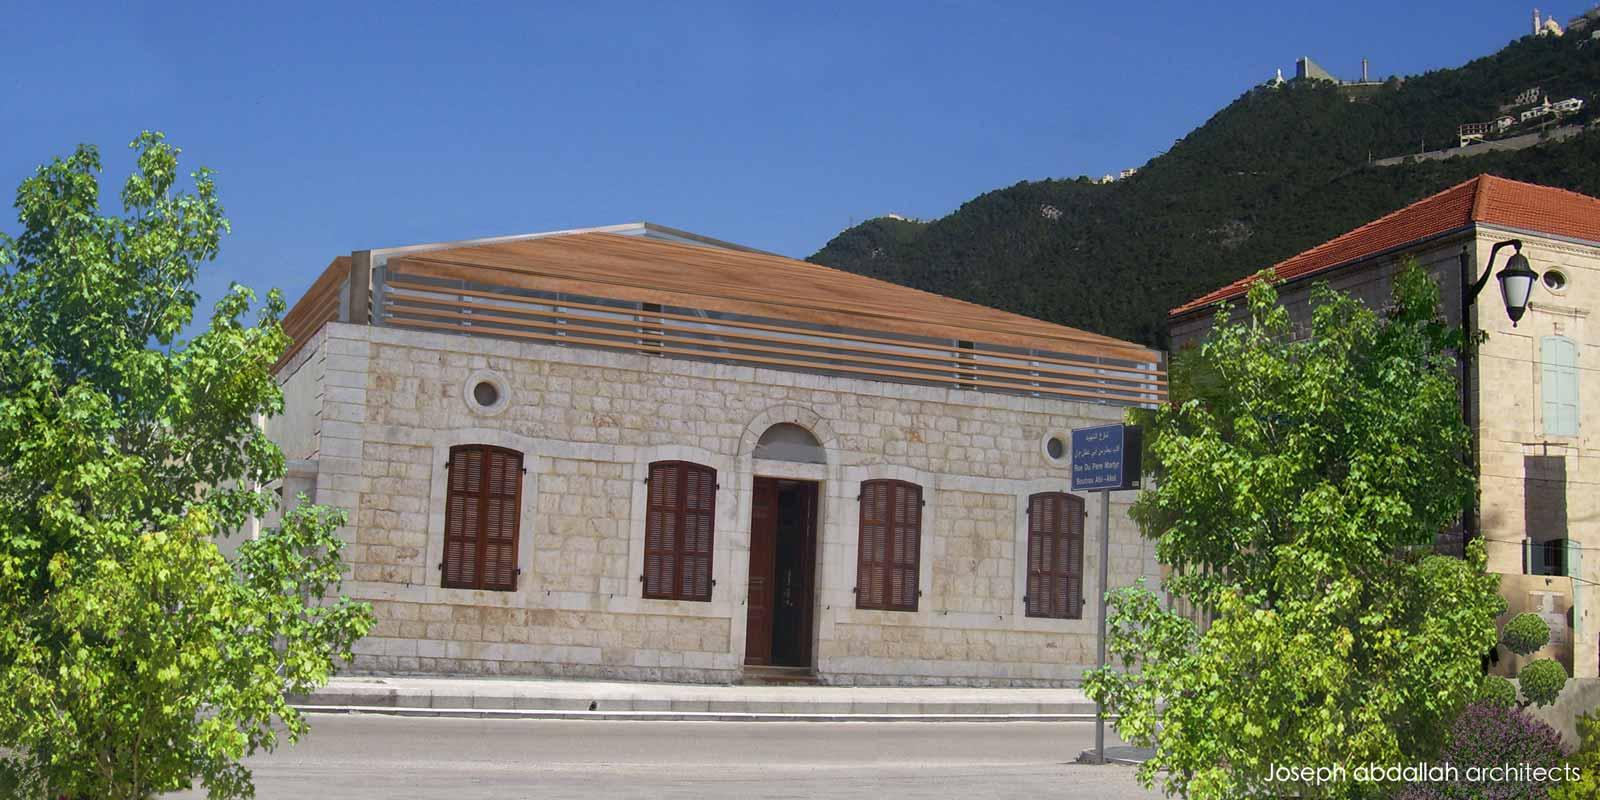 bank-lcb-sgbl-apotres-restoration-architecture-joseph-abdallah-architects-1